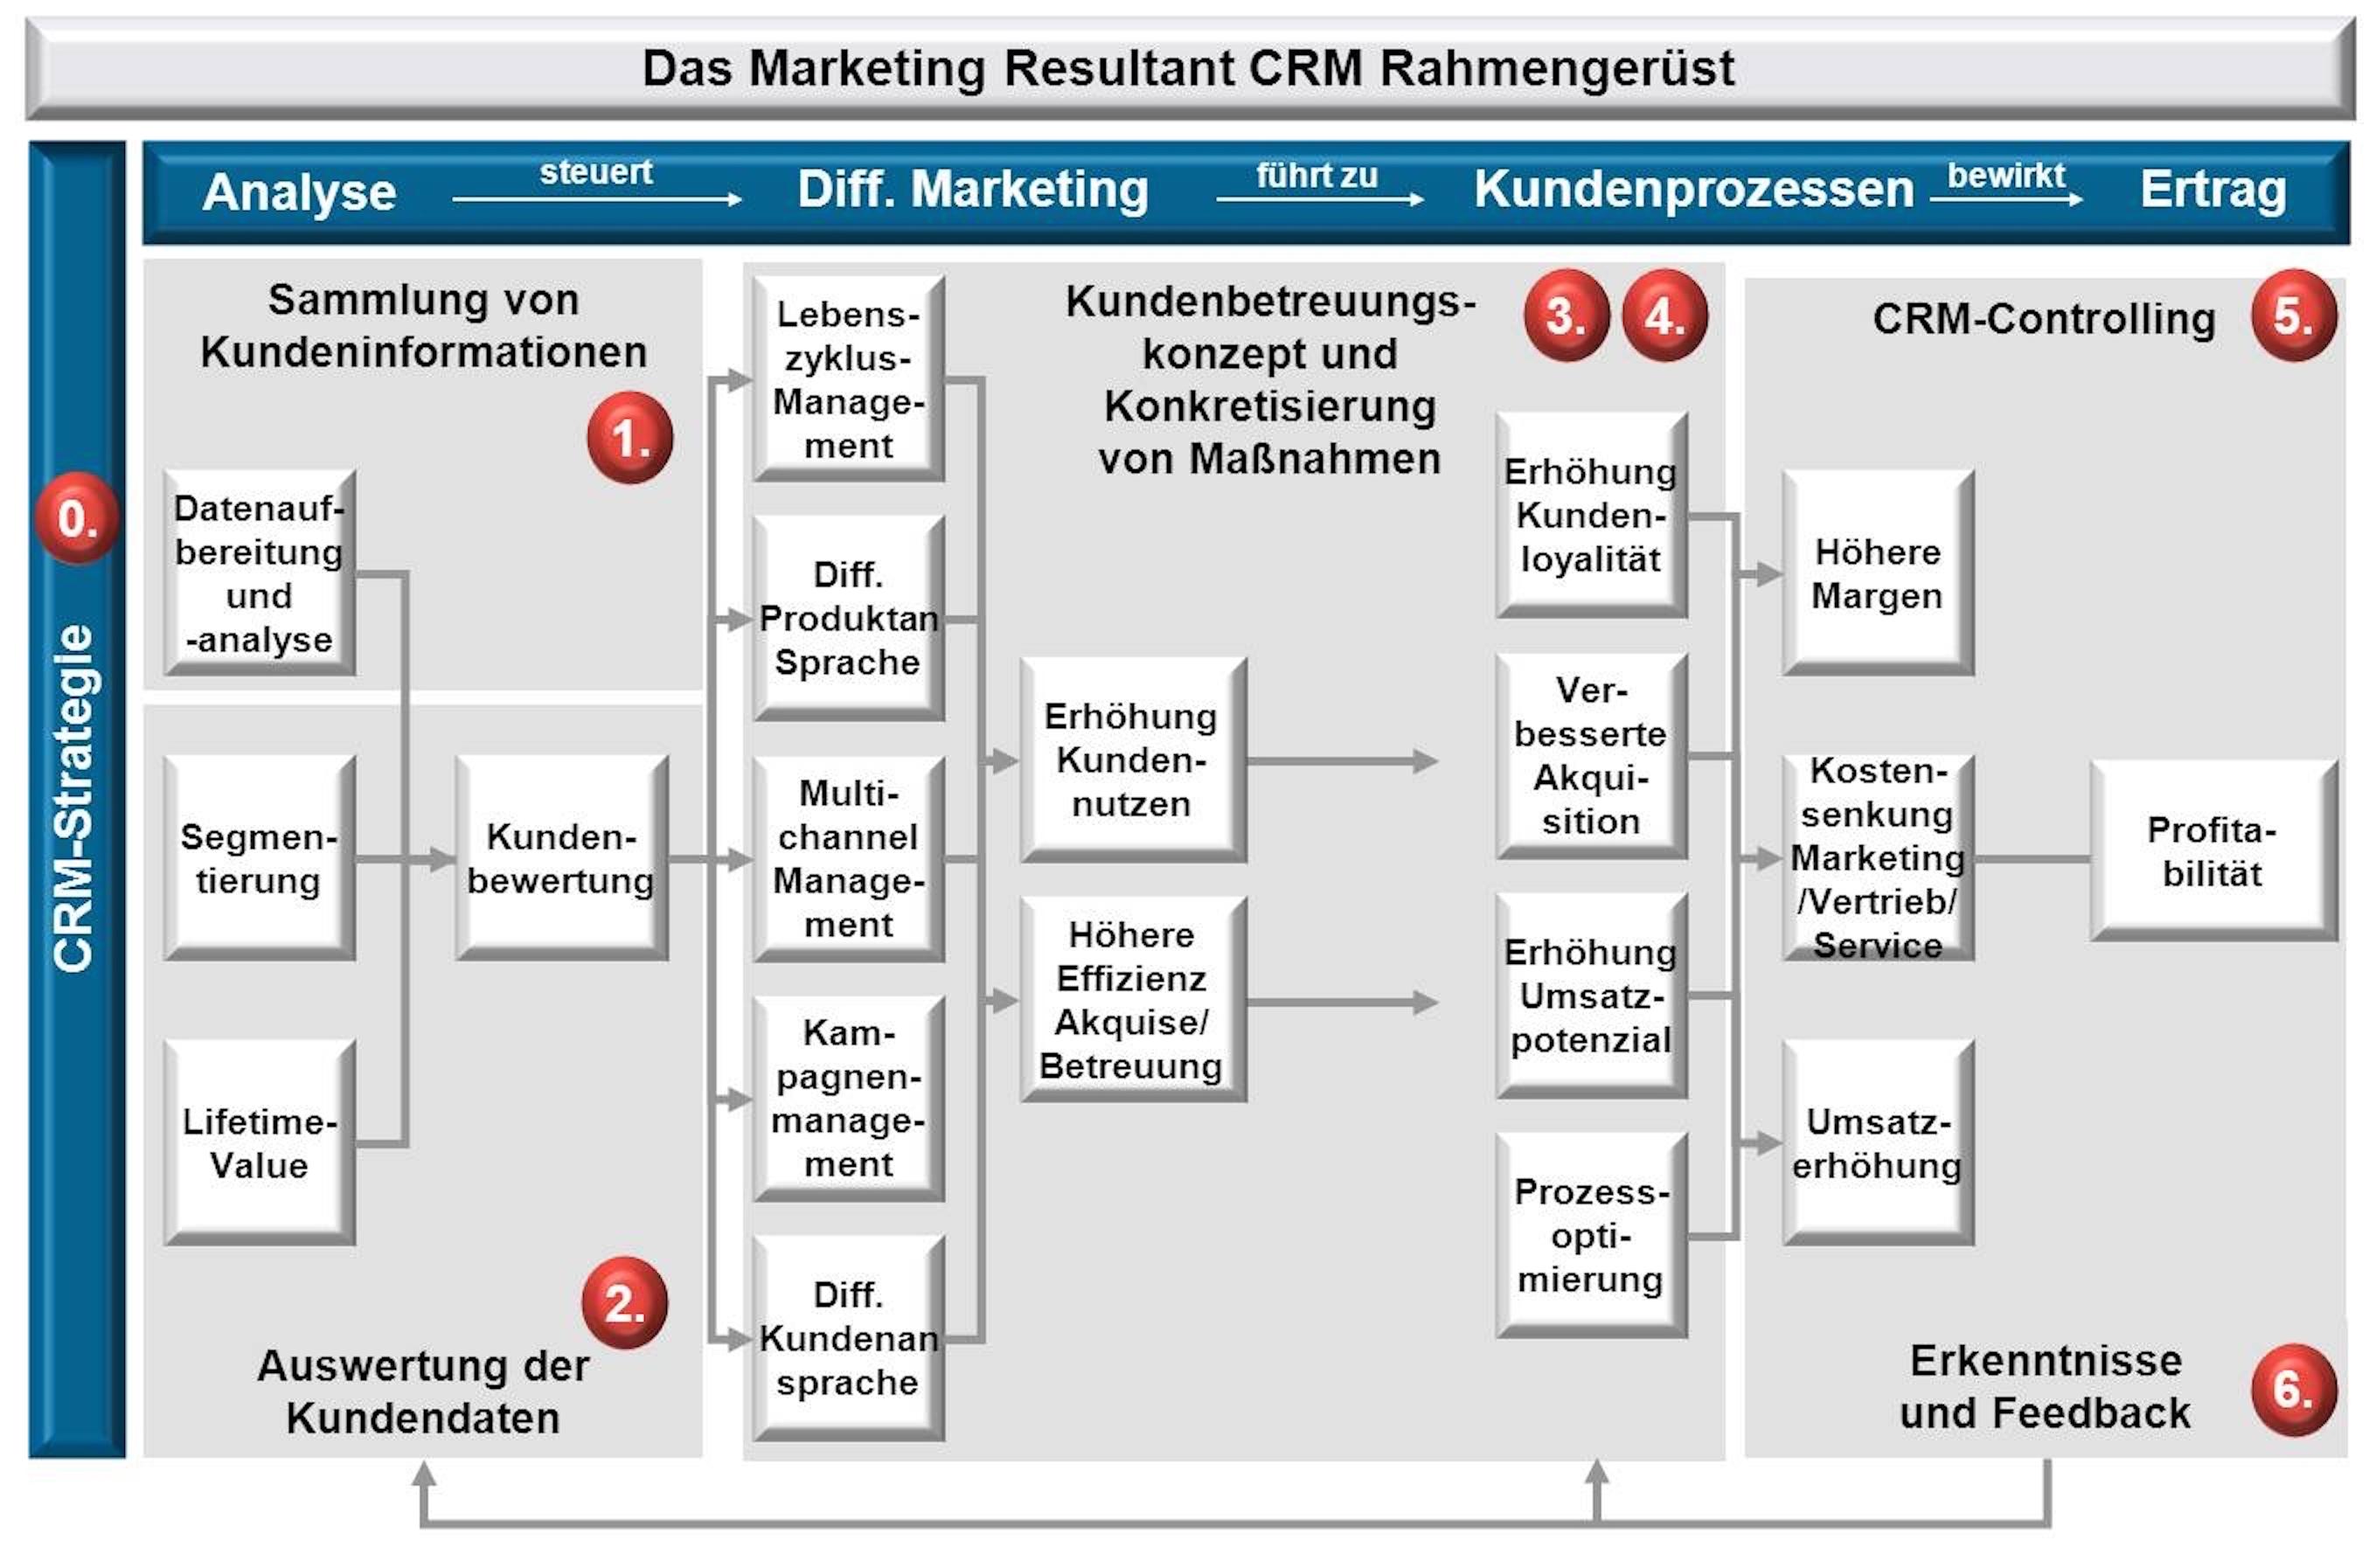 CRM Rahmengerüst Marketing Resultant